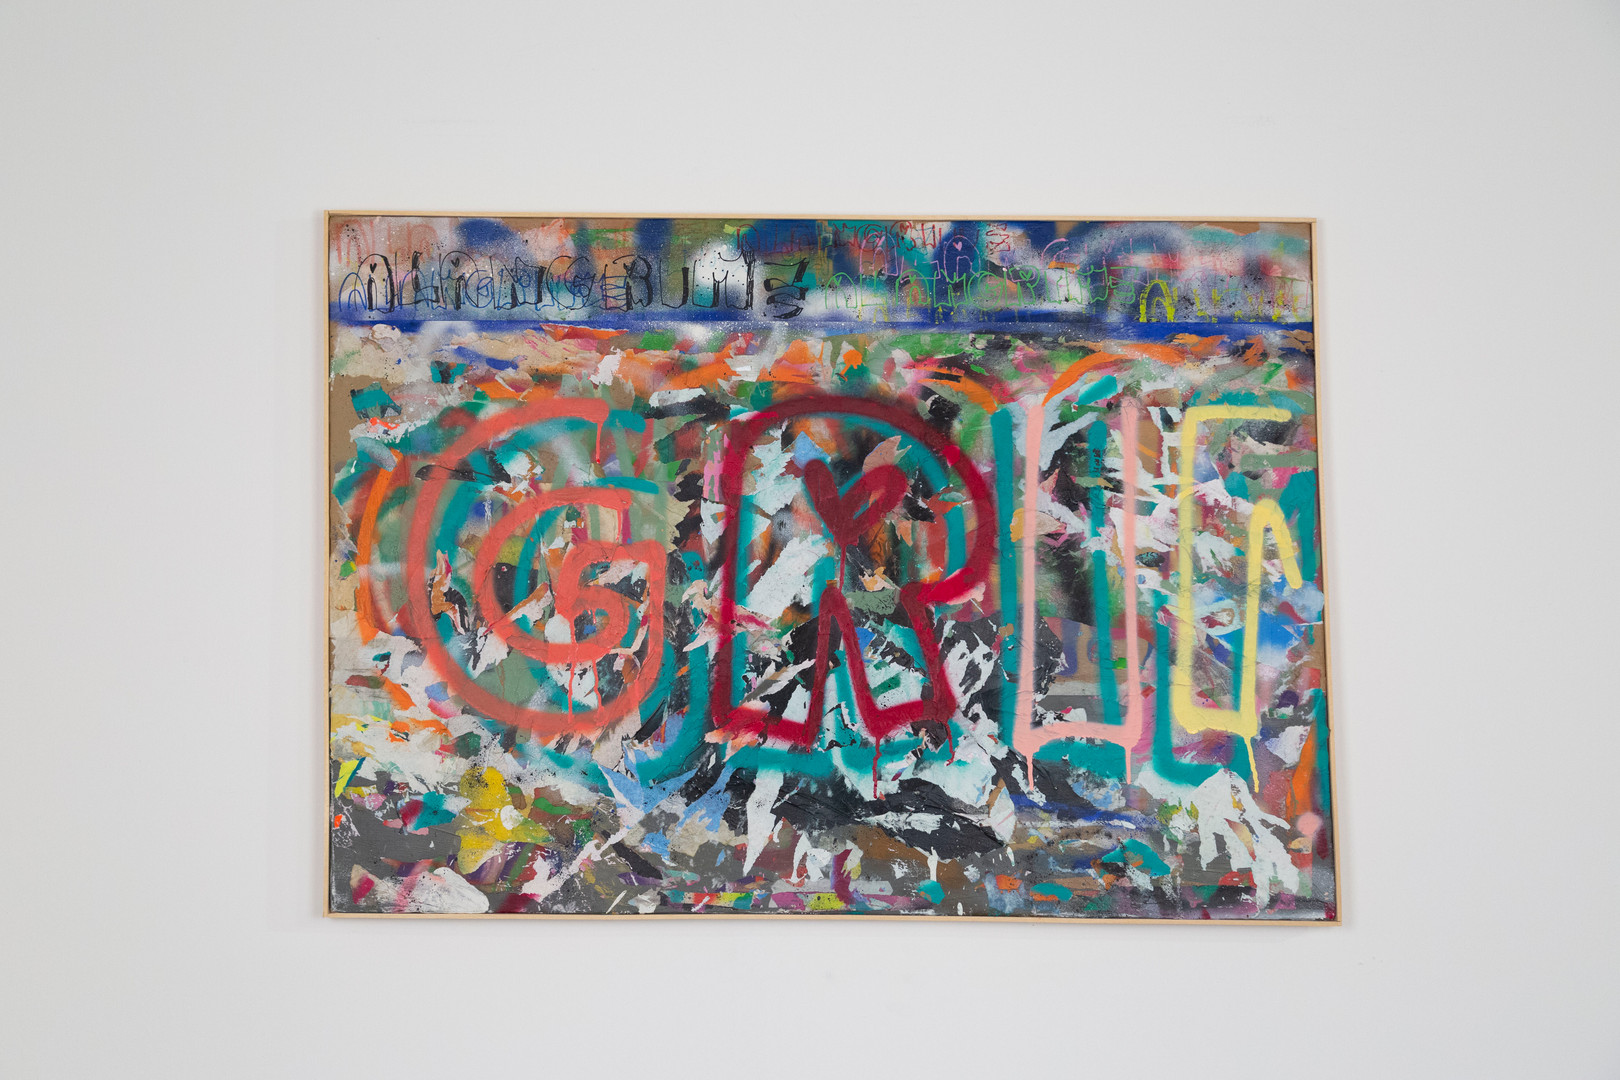 Tecnica mista su tela. 2019 / 100 x 70 cm   Mix media on canvas. 2019 / 39 x 27 inch